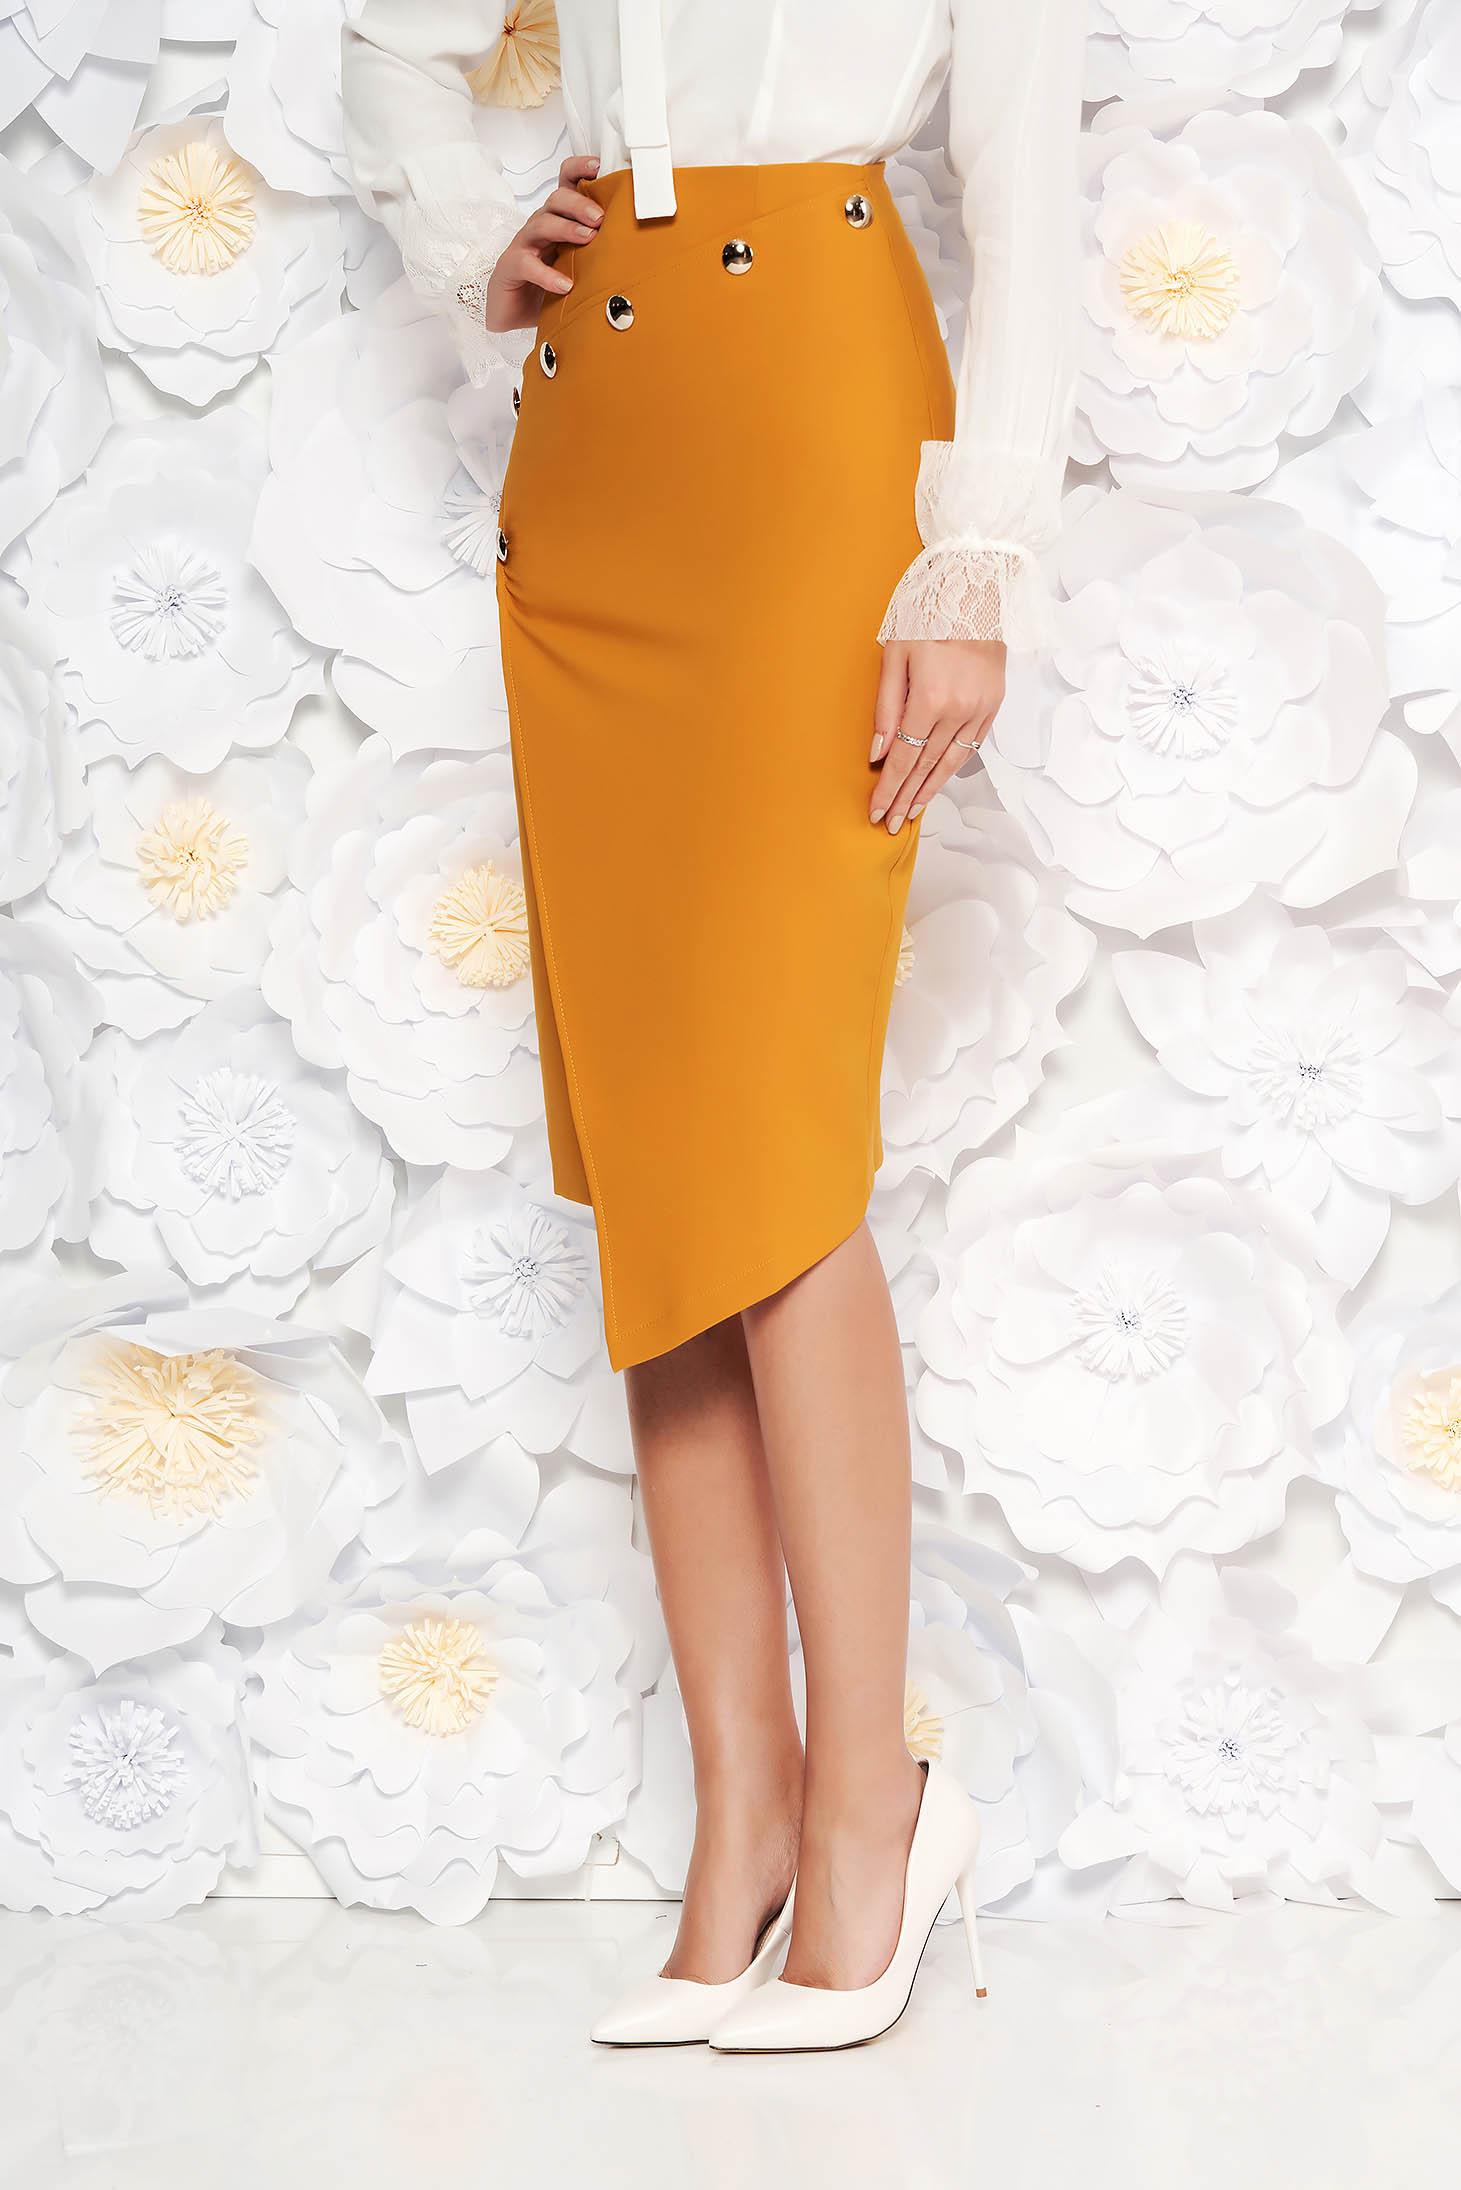 PrettyGirl mustard skirt office midi pencil high waisted slightly elastic fabric with inside lining